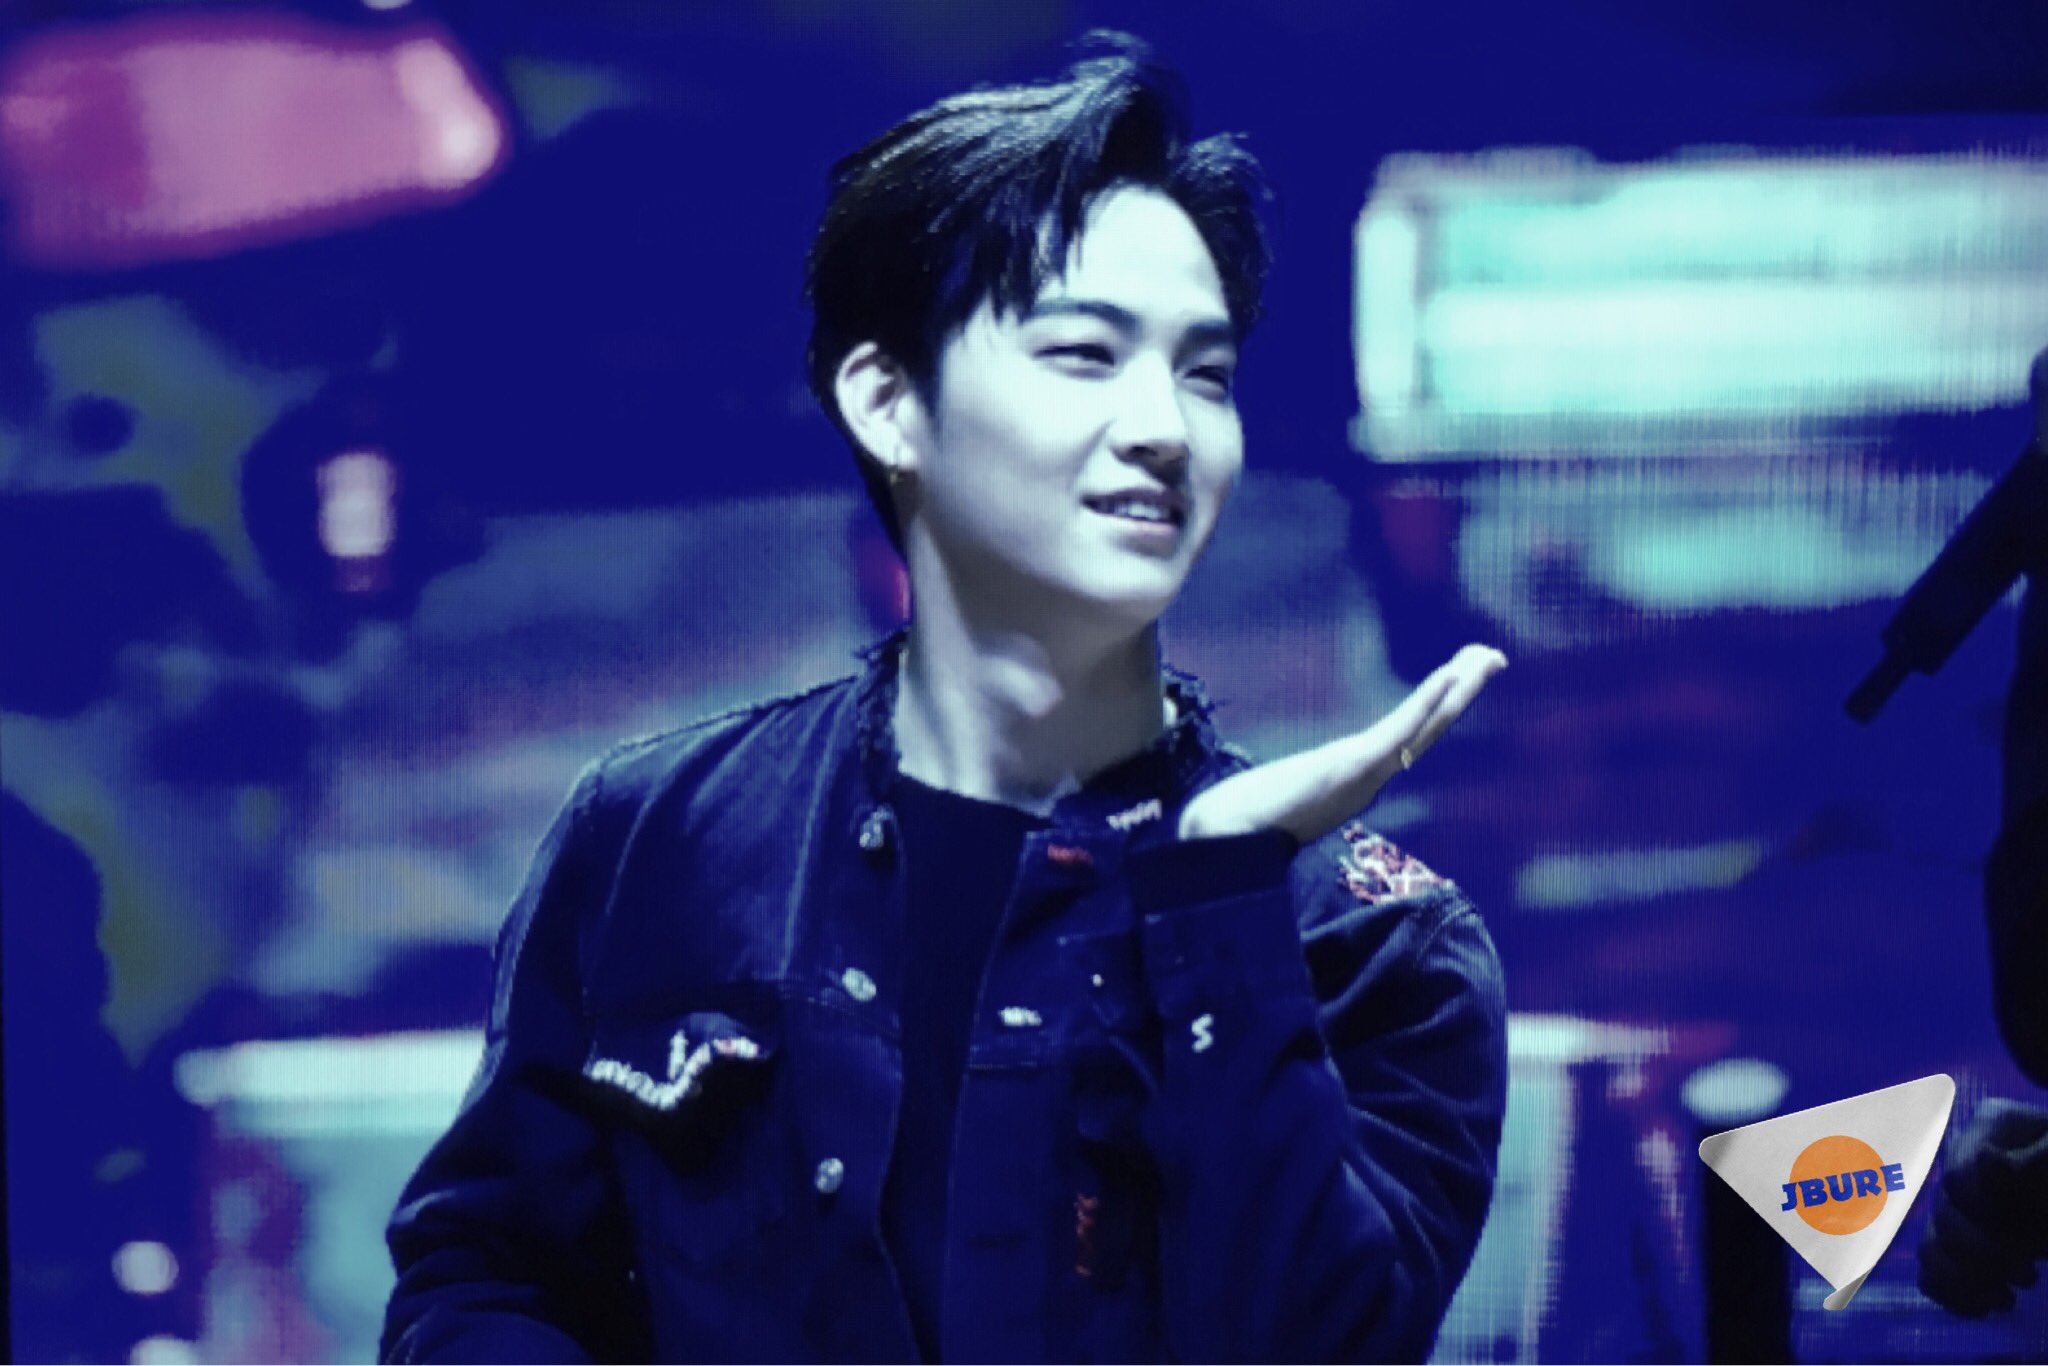 <PREVIEW> 161223 #GOT7inManila  ┊�� #갓세븐 #GOT7  #제이비 #재범 #JB #Jaebeom https://t.co/48VwHdp6gg